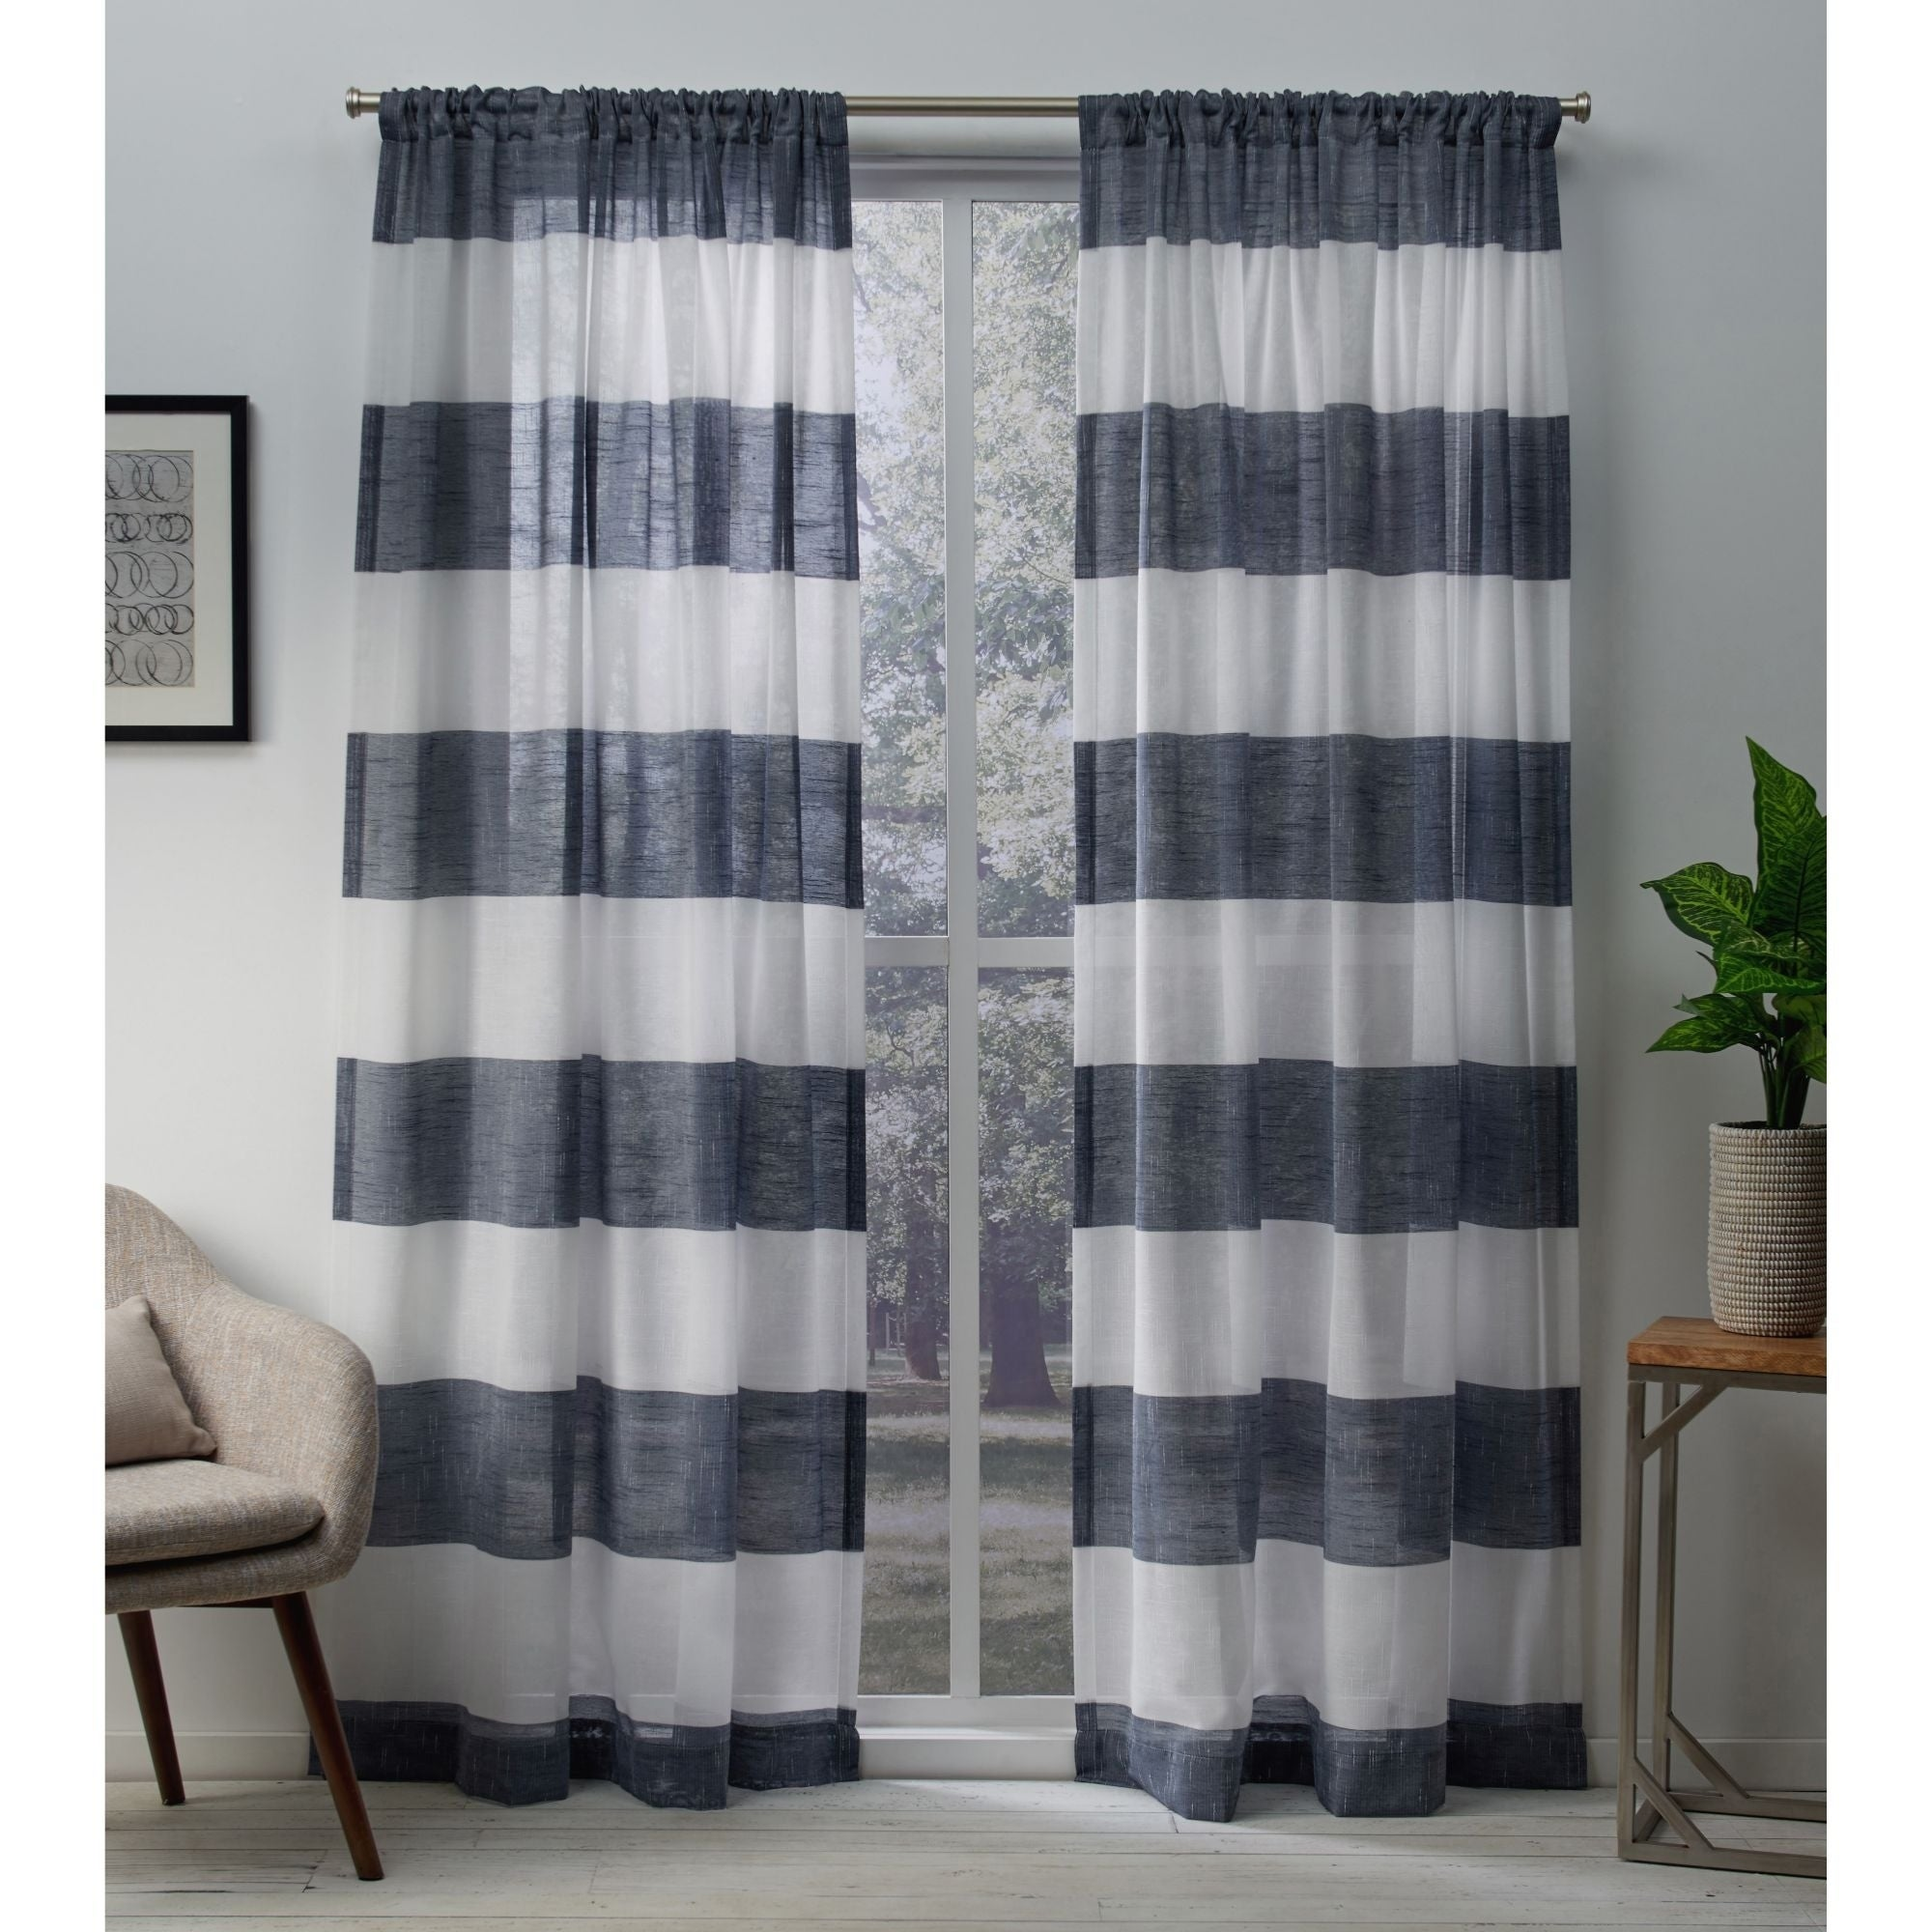 2 panels Rod pocket top...A pair of linen curtain panels...